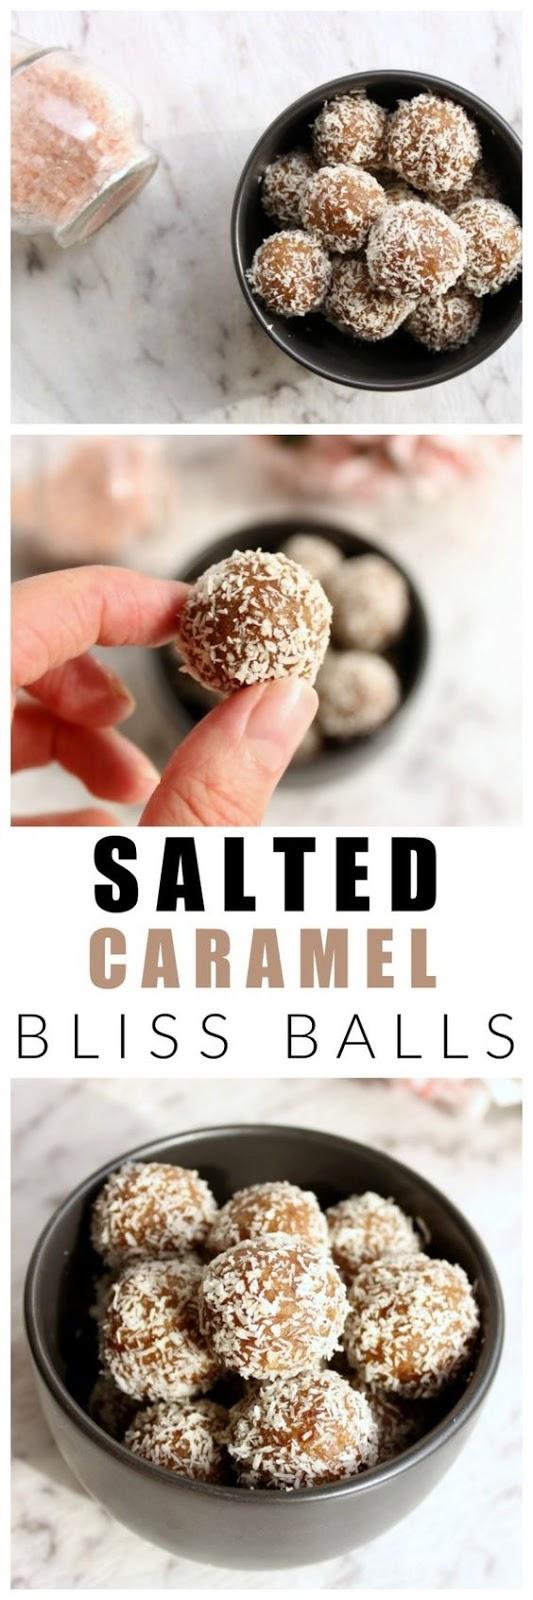 Salted caramel bliss balls | Healthy, refined sugar free